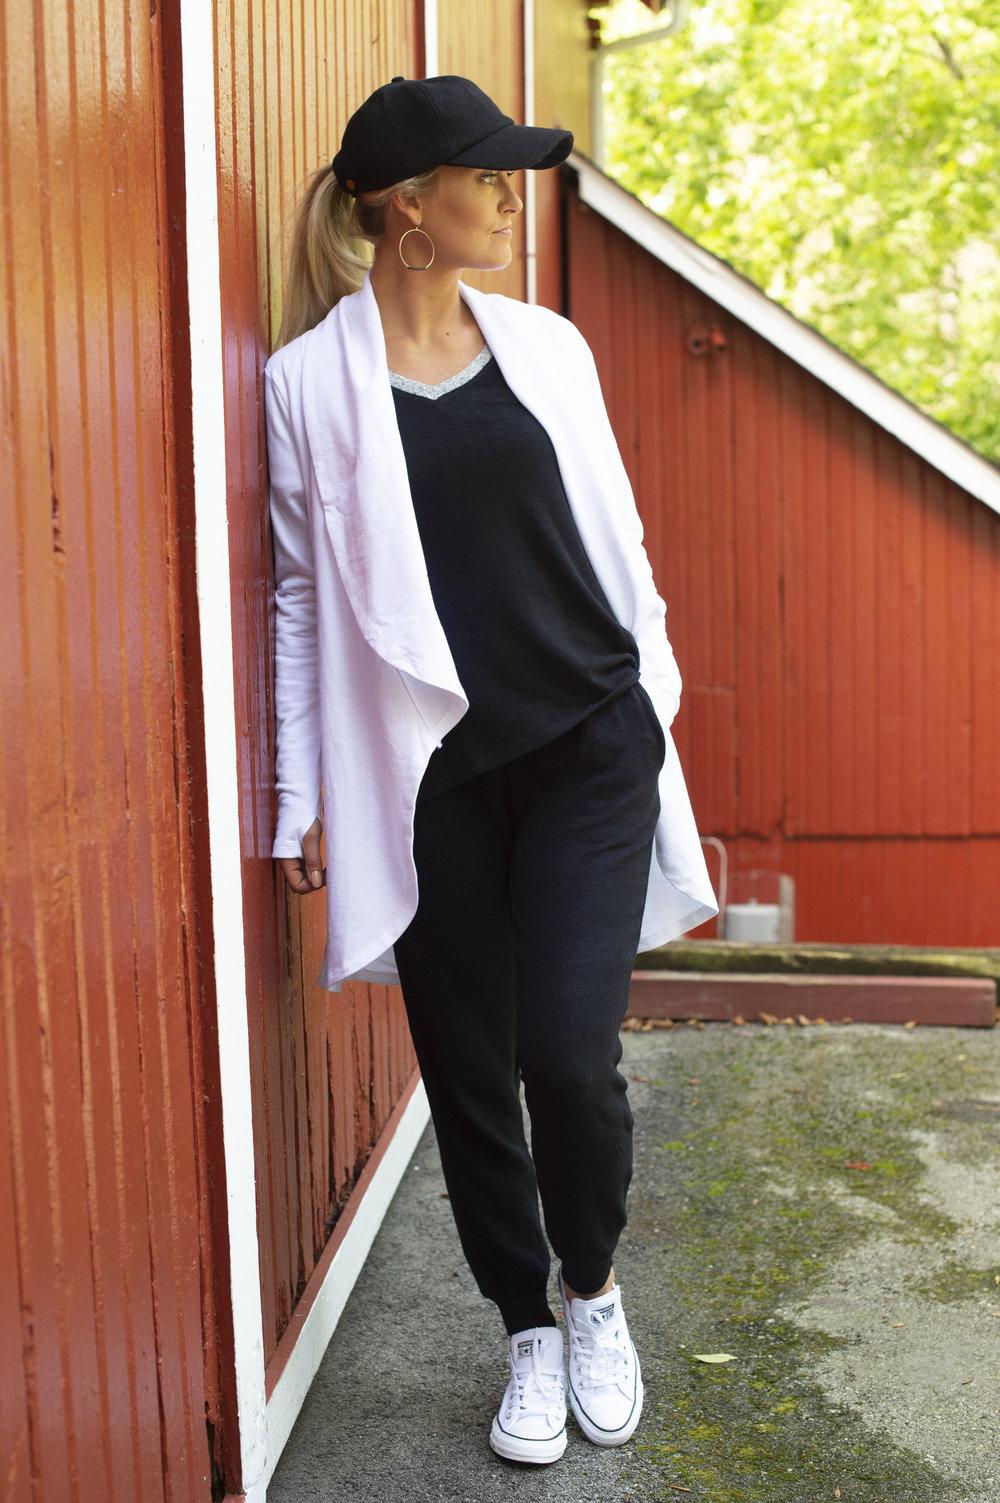 20180906_Barn Fashion_0058.jpg